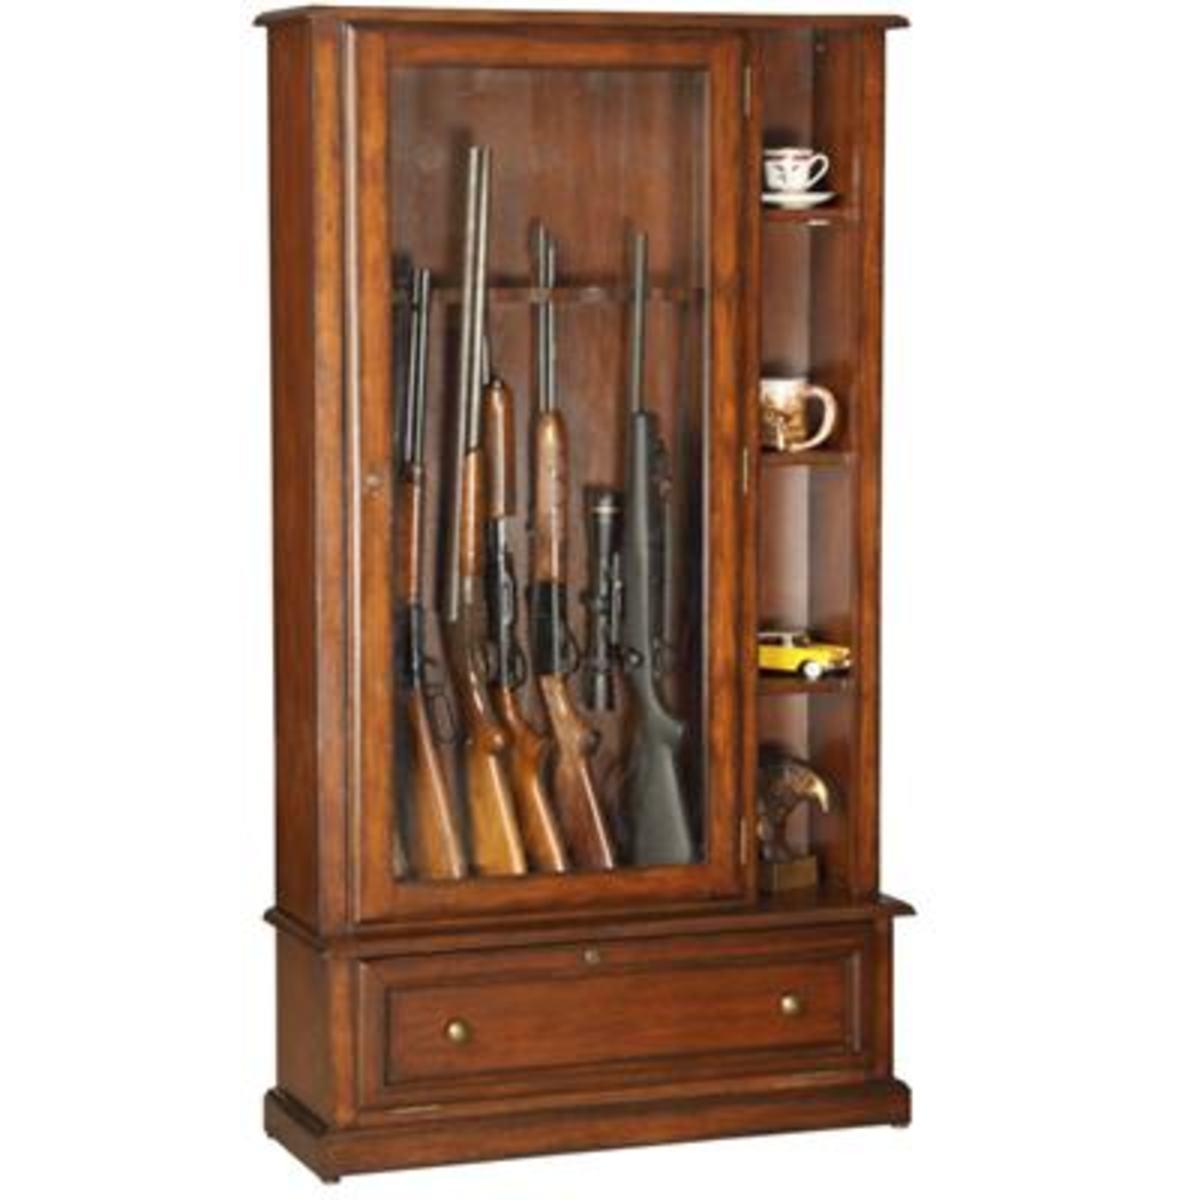 Wooden gun cabinet for your home for Muebles para guardar armas de fuego